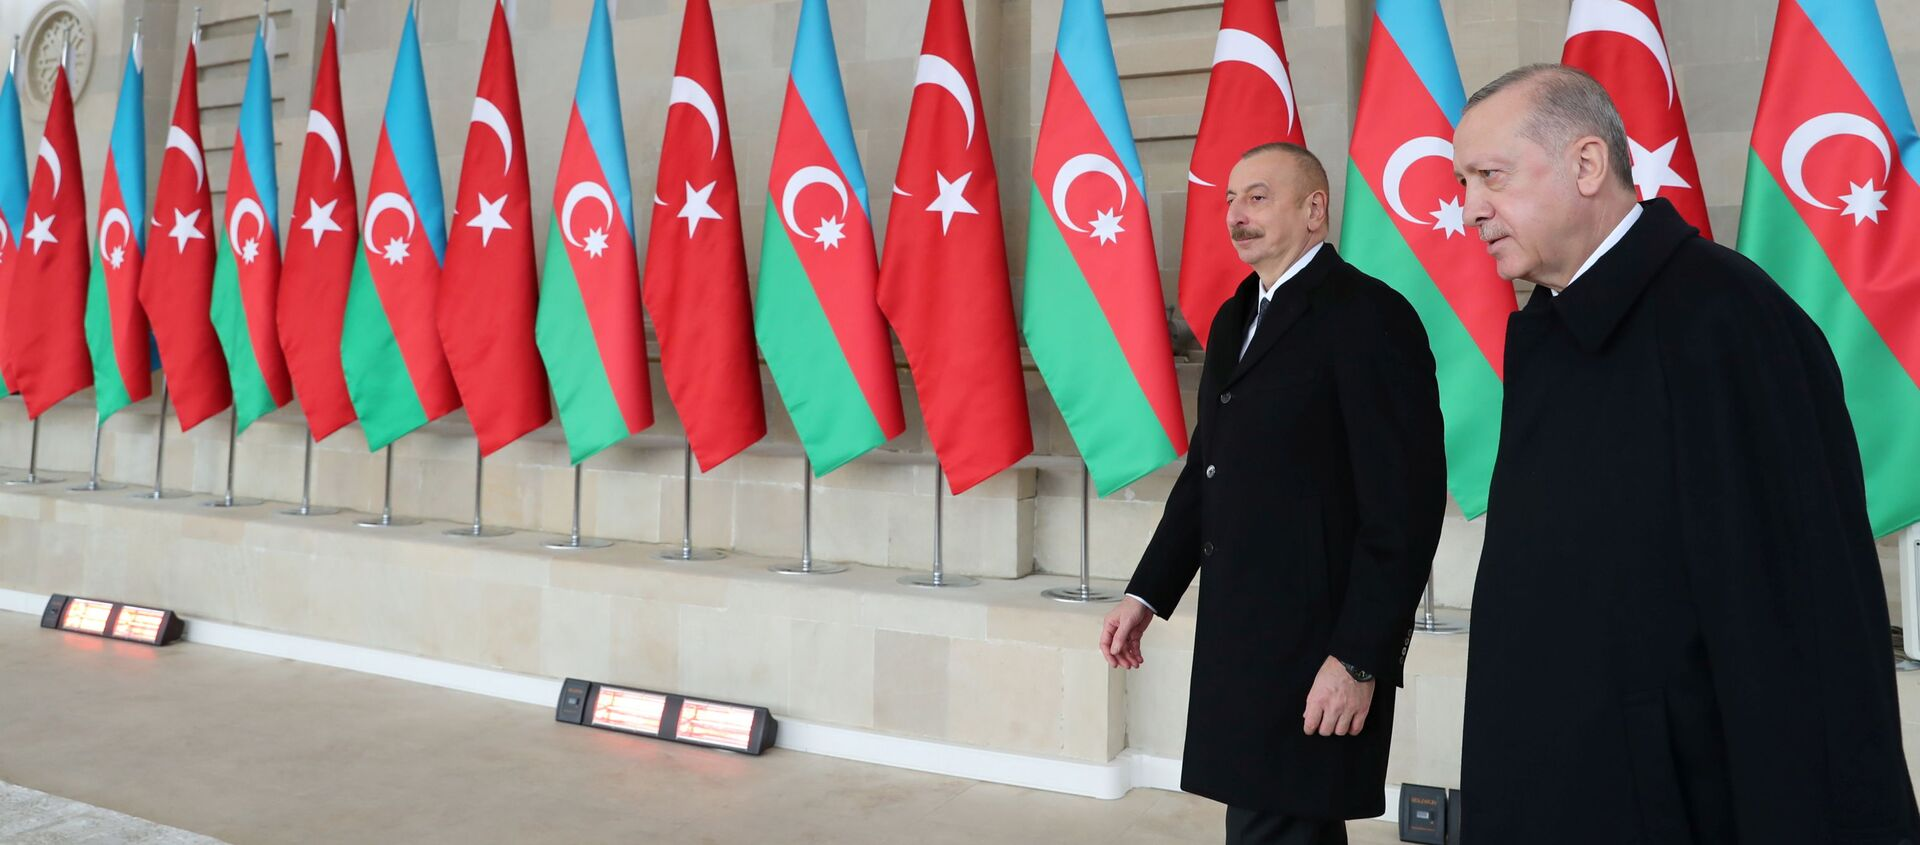 Президент Азербайджана Ильхам Алиев и Президент Турции Реджеп Тайип Эрдоган на военном параде в Баку, фото из архив - Sputnik Азербайджан, 1920, 20.02.2021